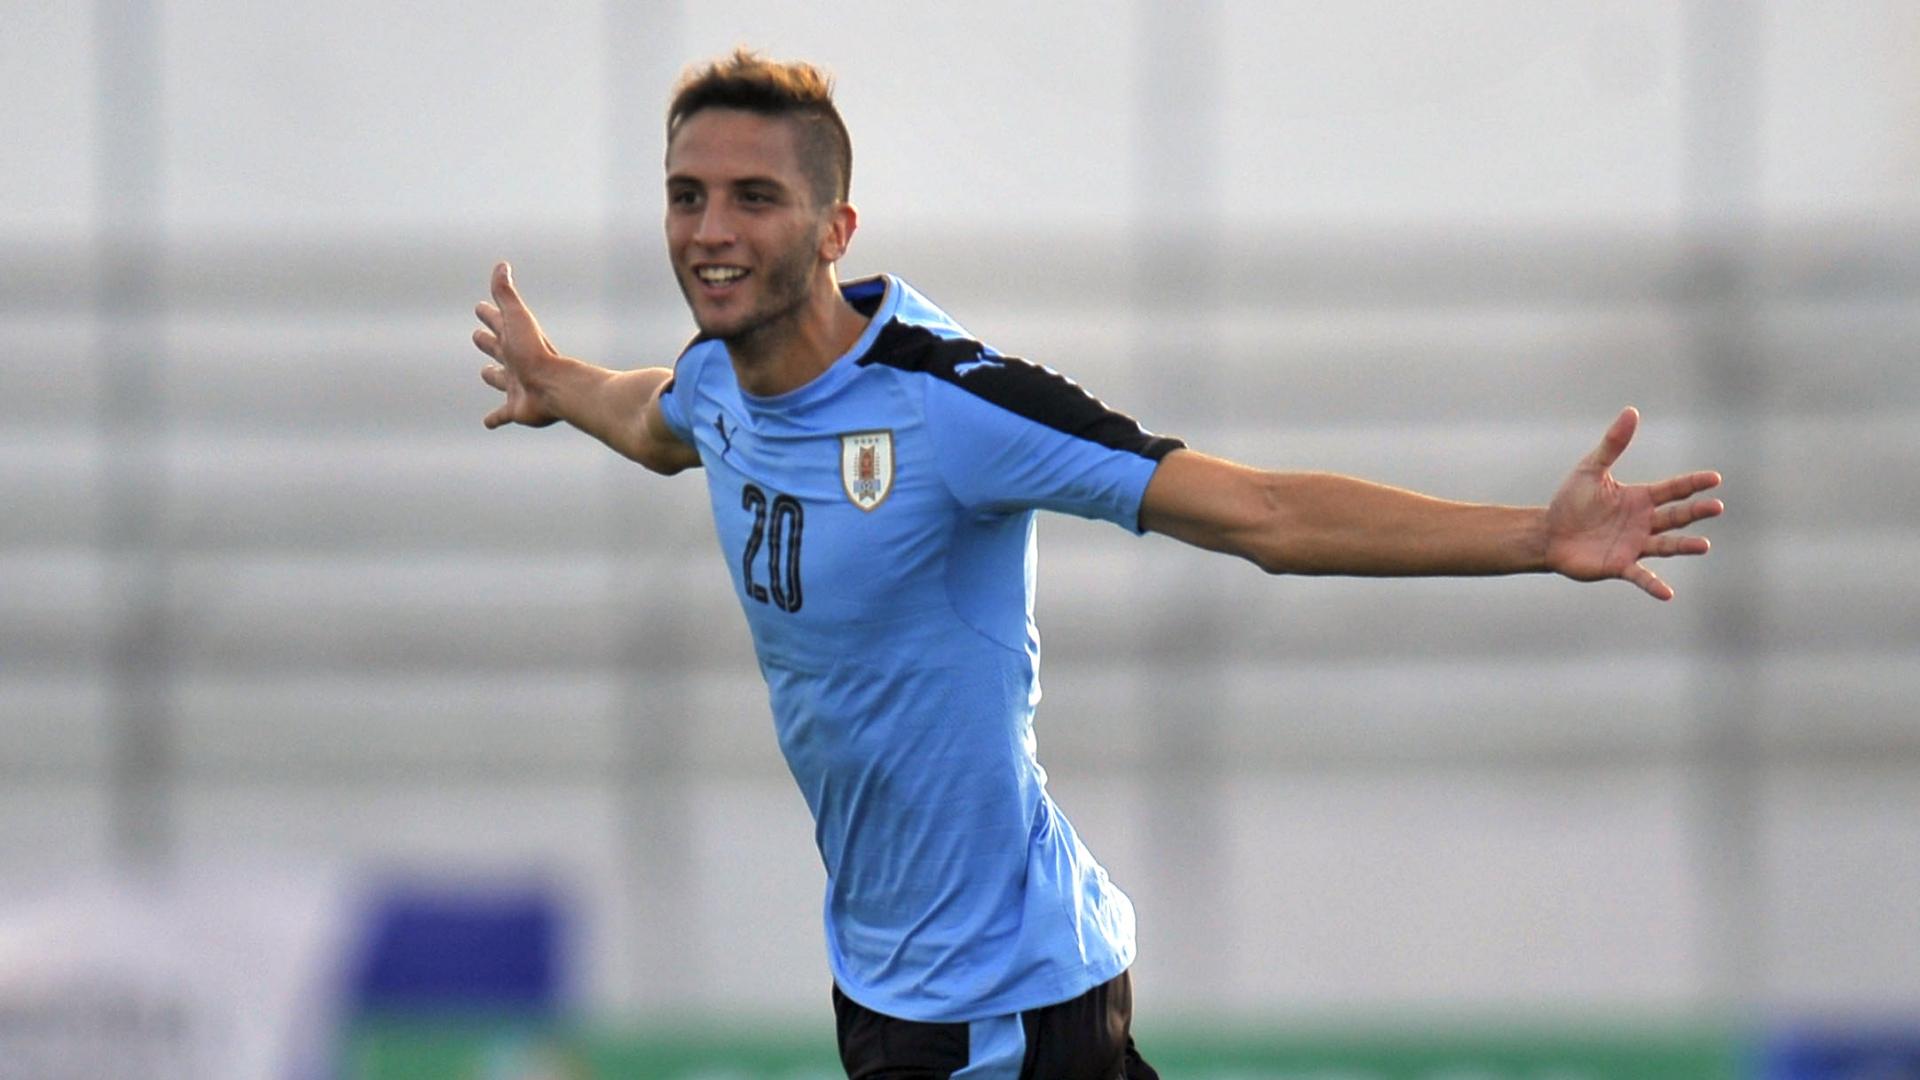 Calcio: Italia U.20 sconfitta da Uruguay